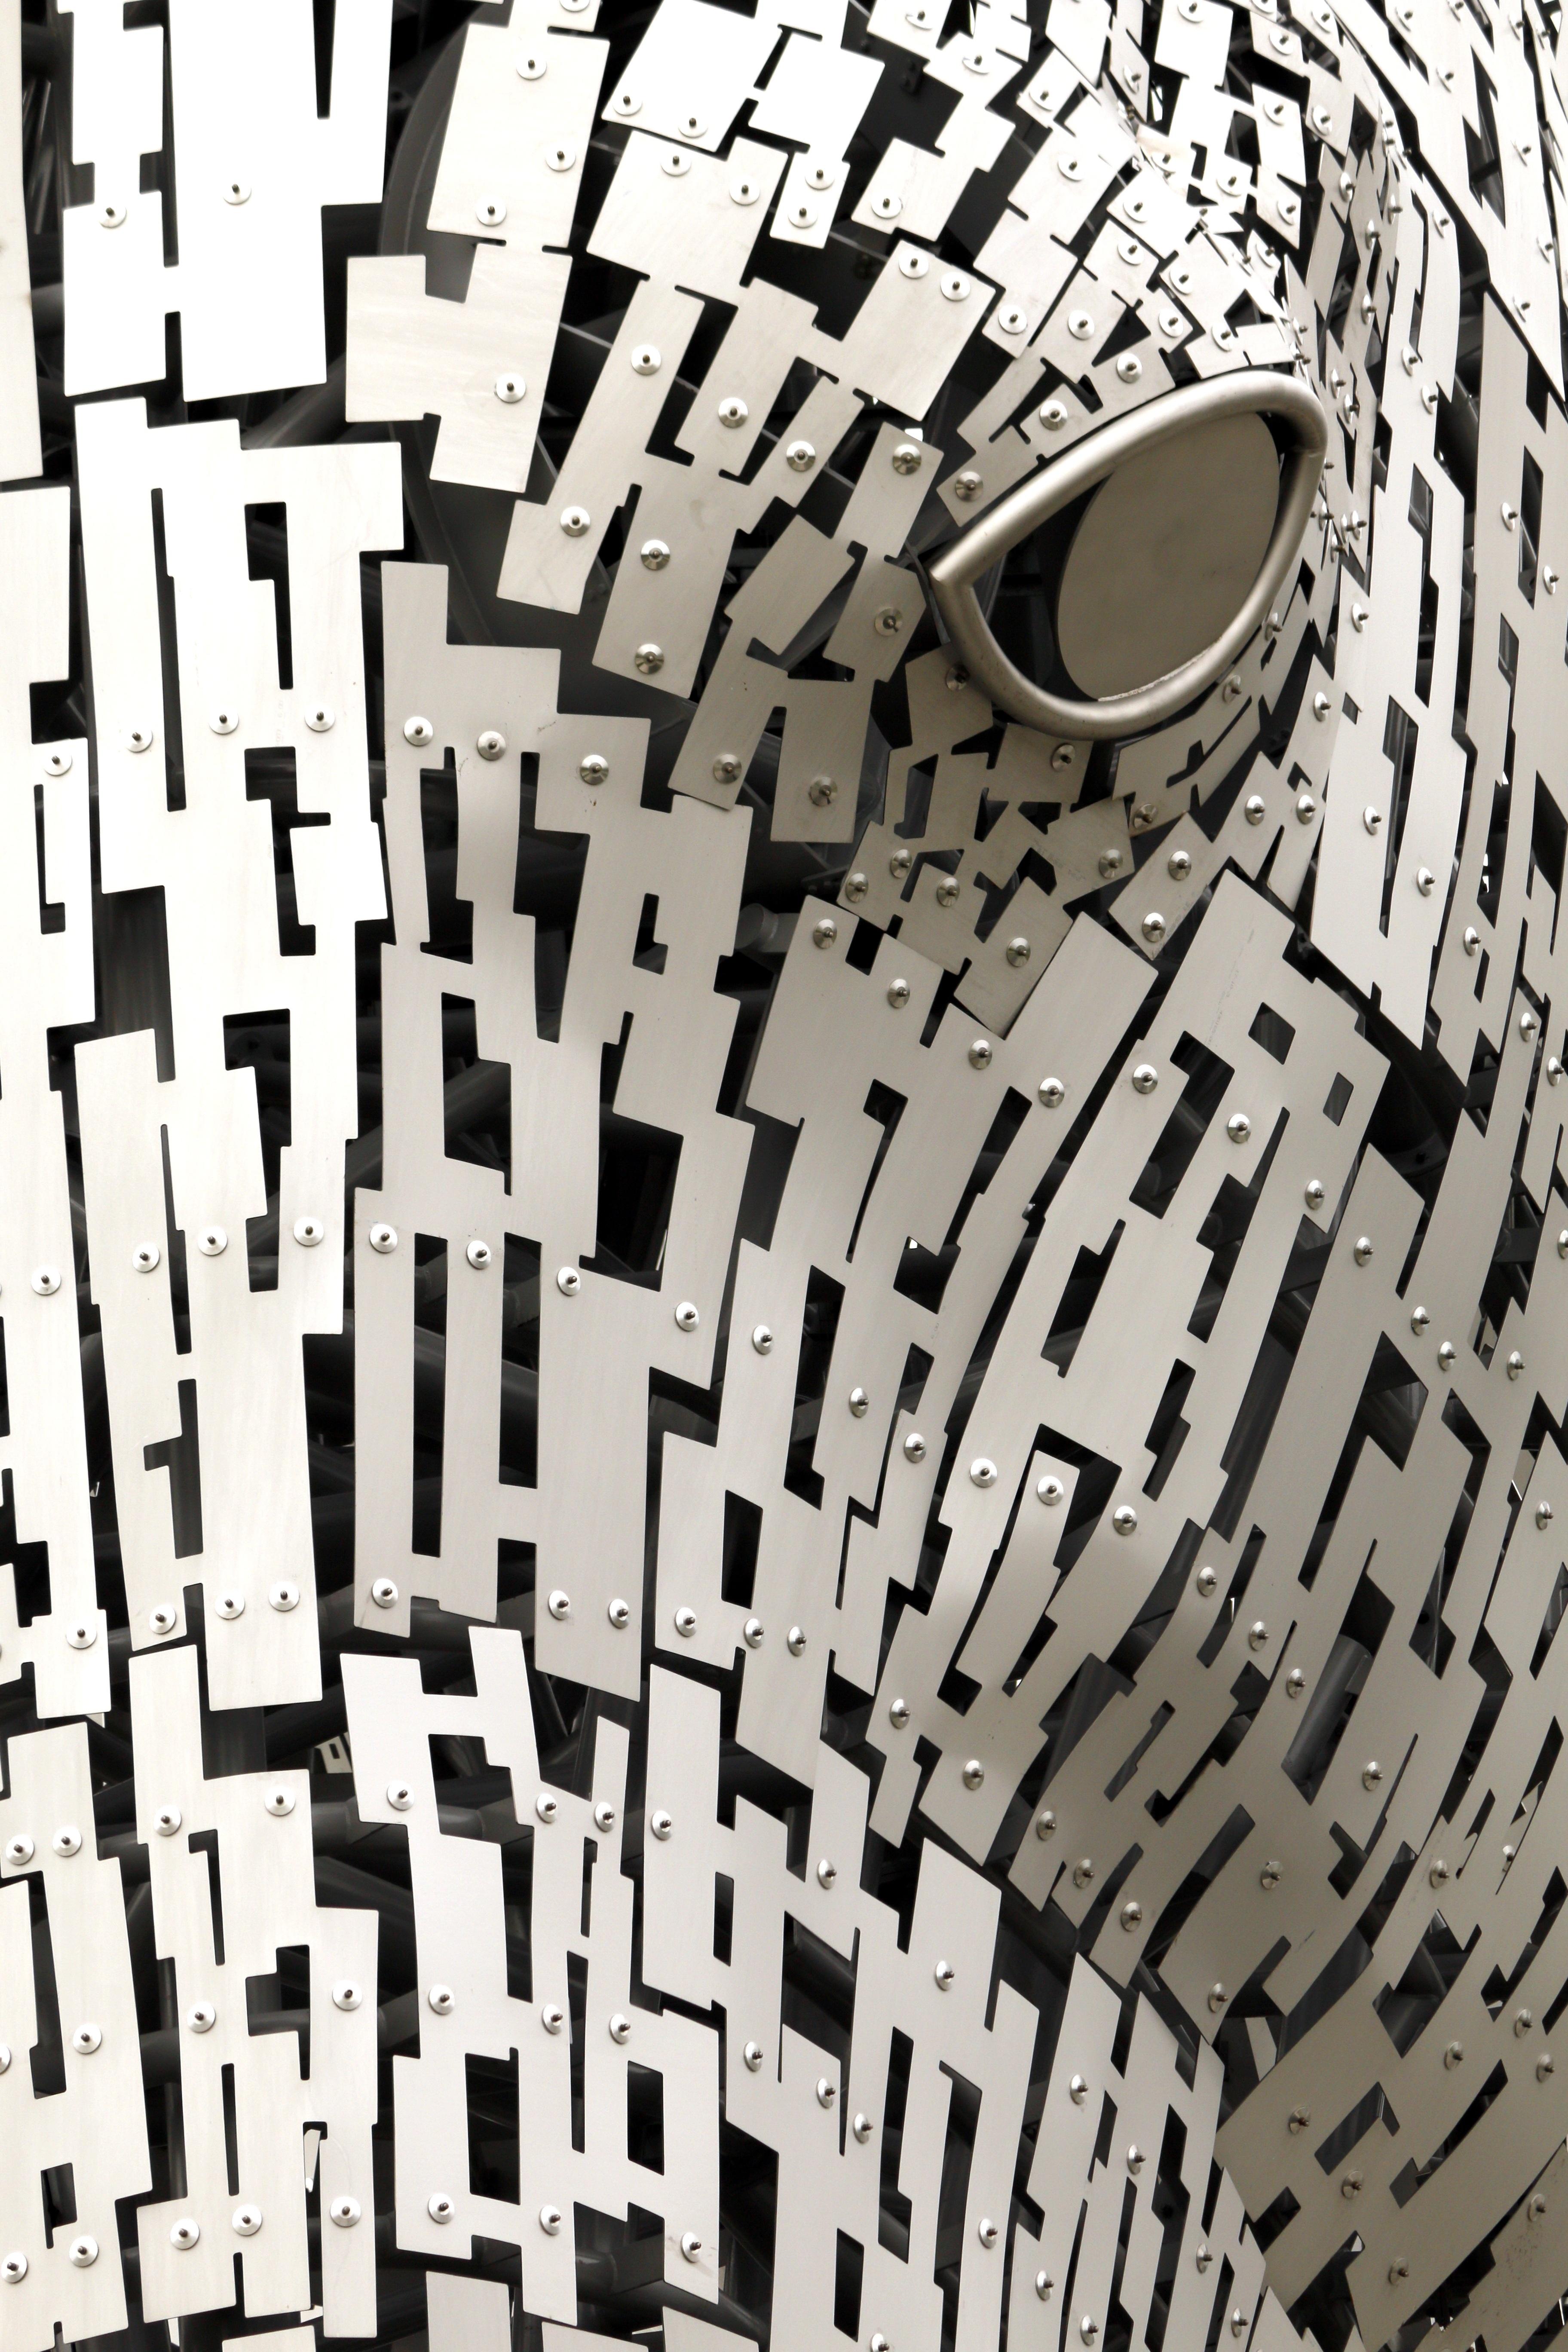 Black and white animal patterns